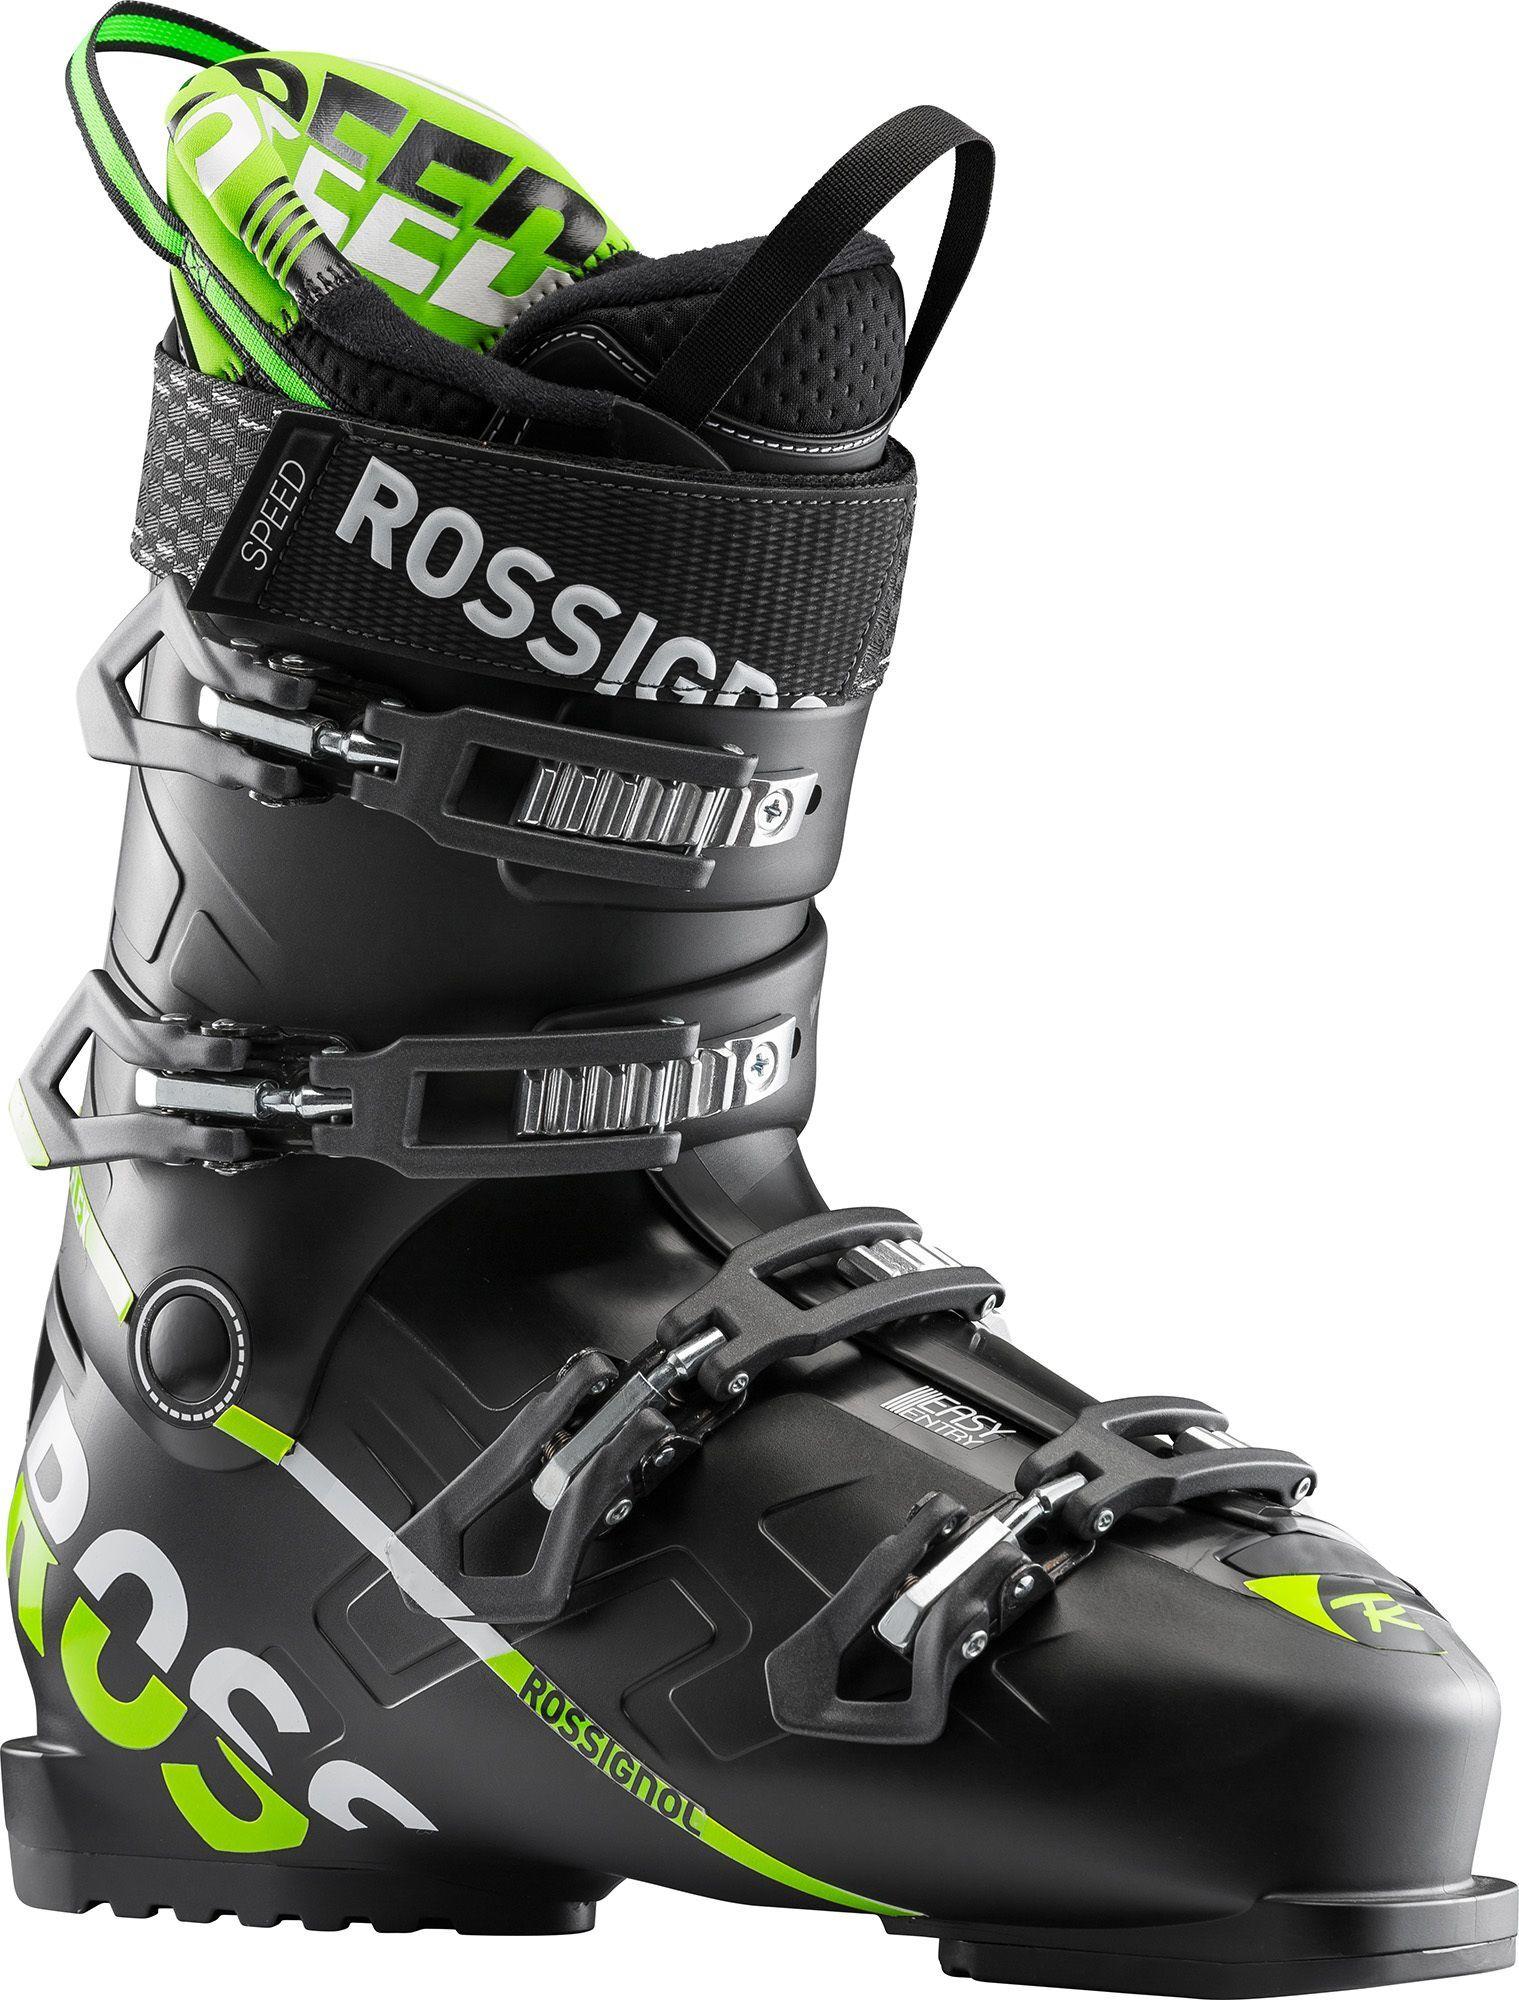 Rossignol ski cipele SPEED 80